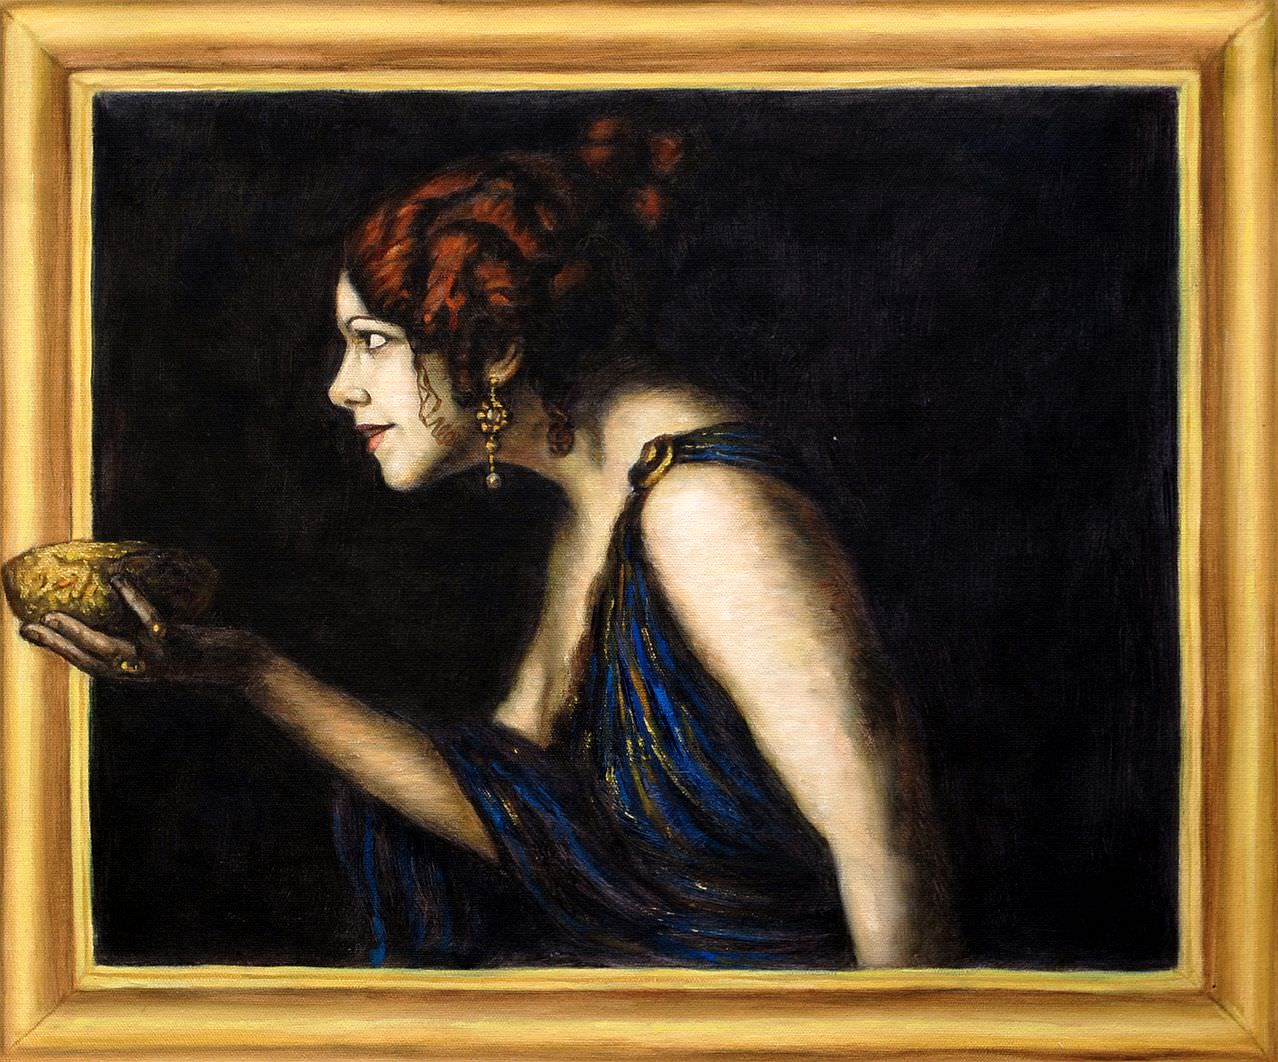 Franz von Stuck - Tilla Durieux als Circe 3d optik c95346 50x60cm edles Ölgemälde handgemalt Museumsqualität